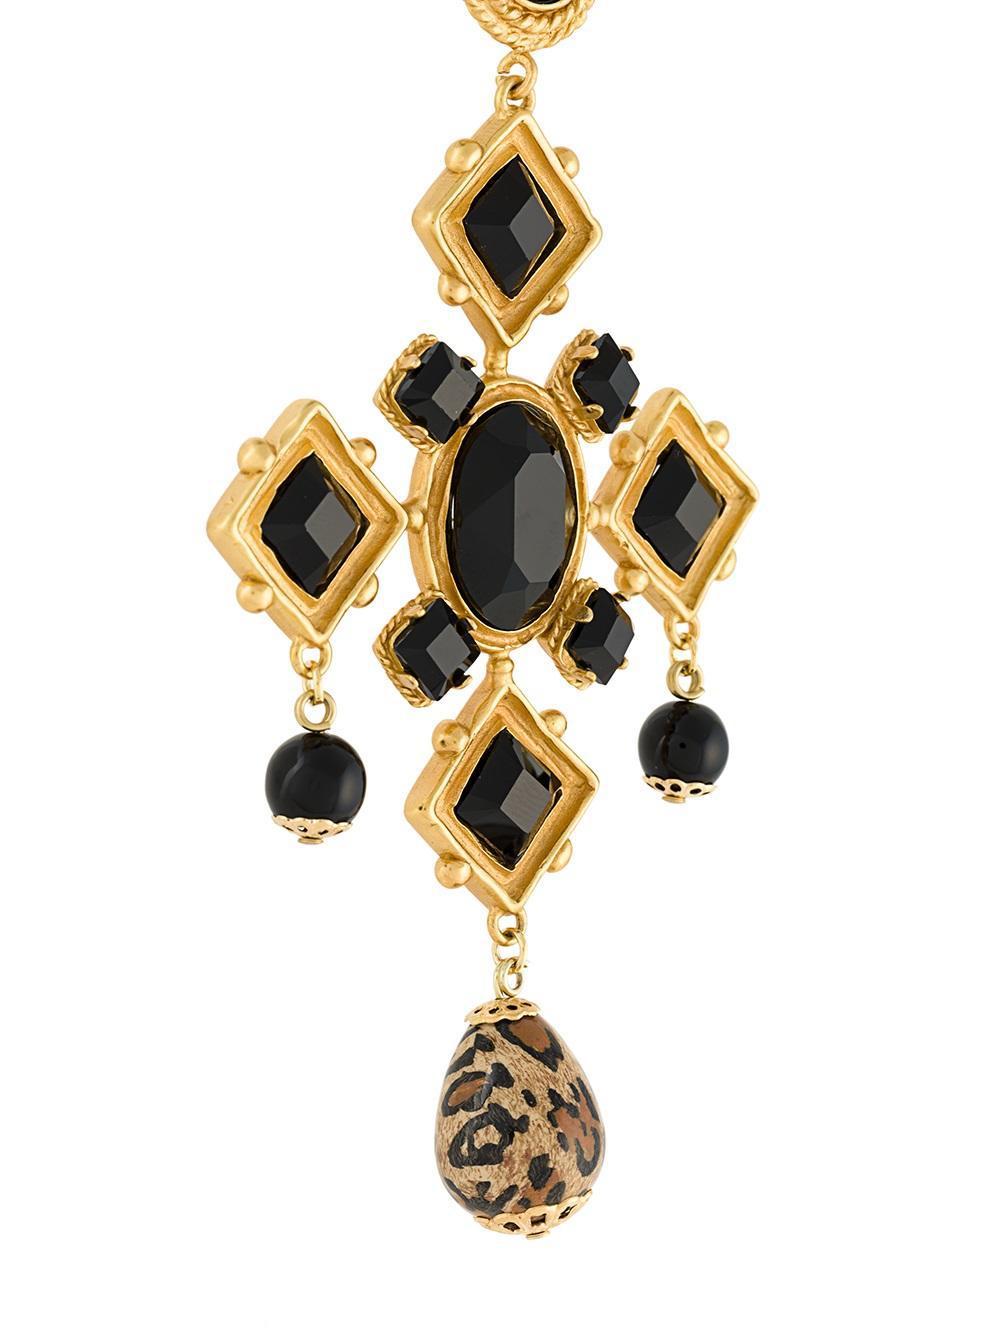 Dolce & Gabbana Long Beaded Cross Necklace in Black